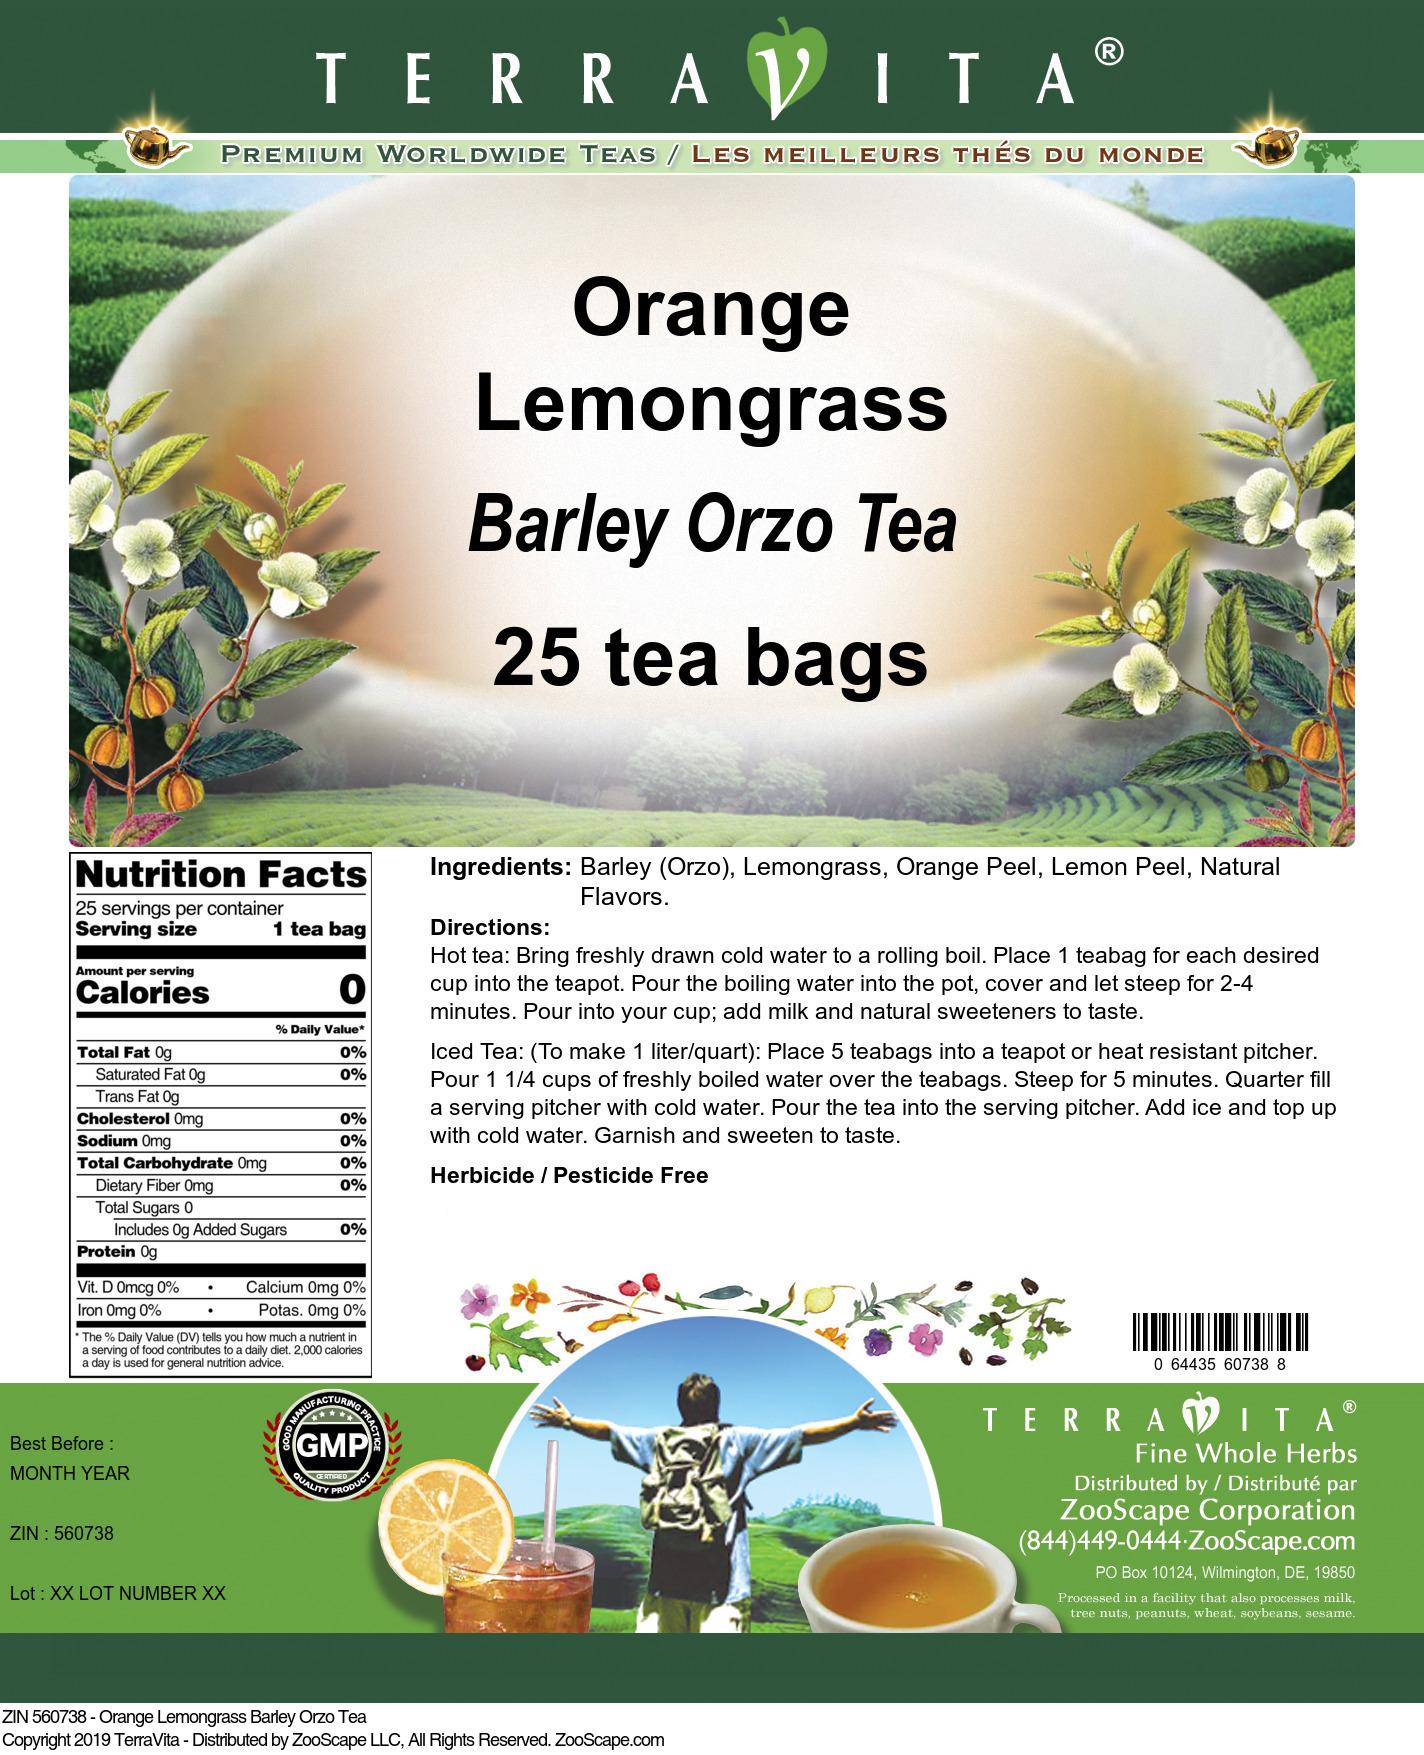 Orange Lemongrass Barley Orzo